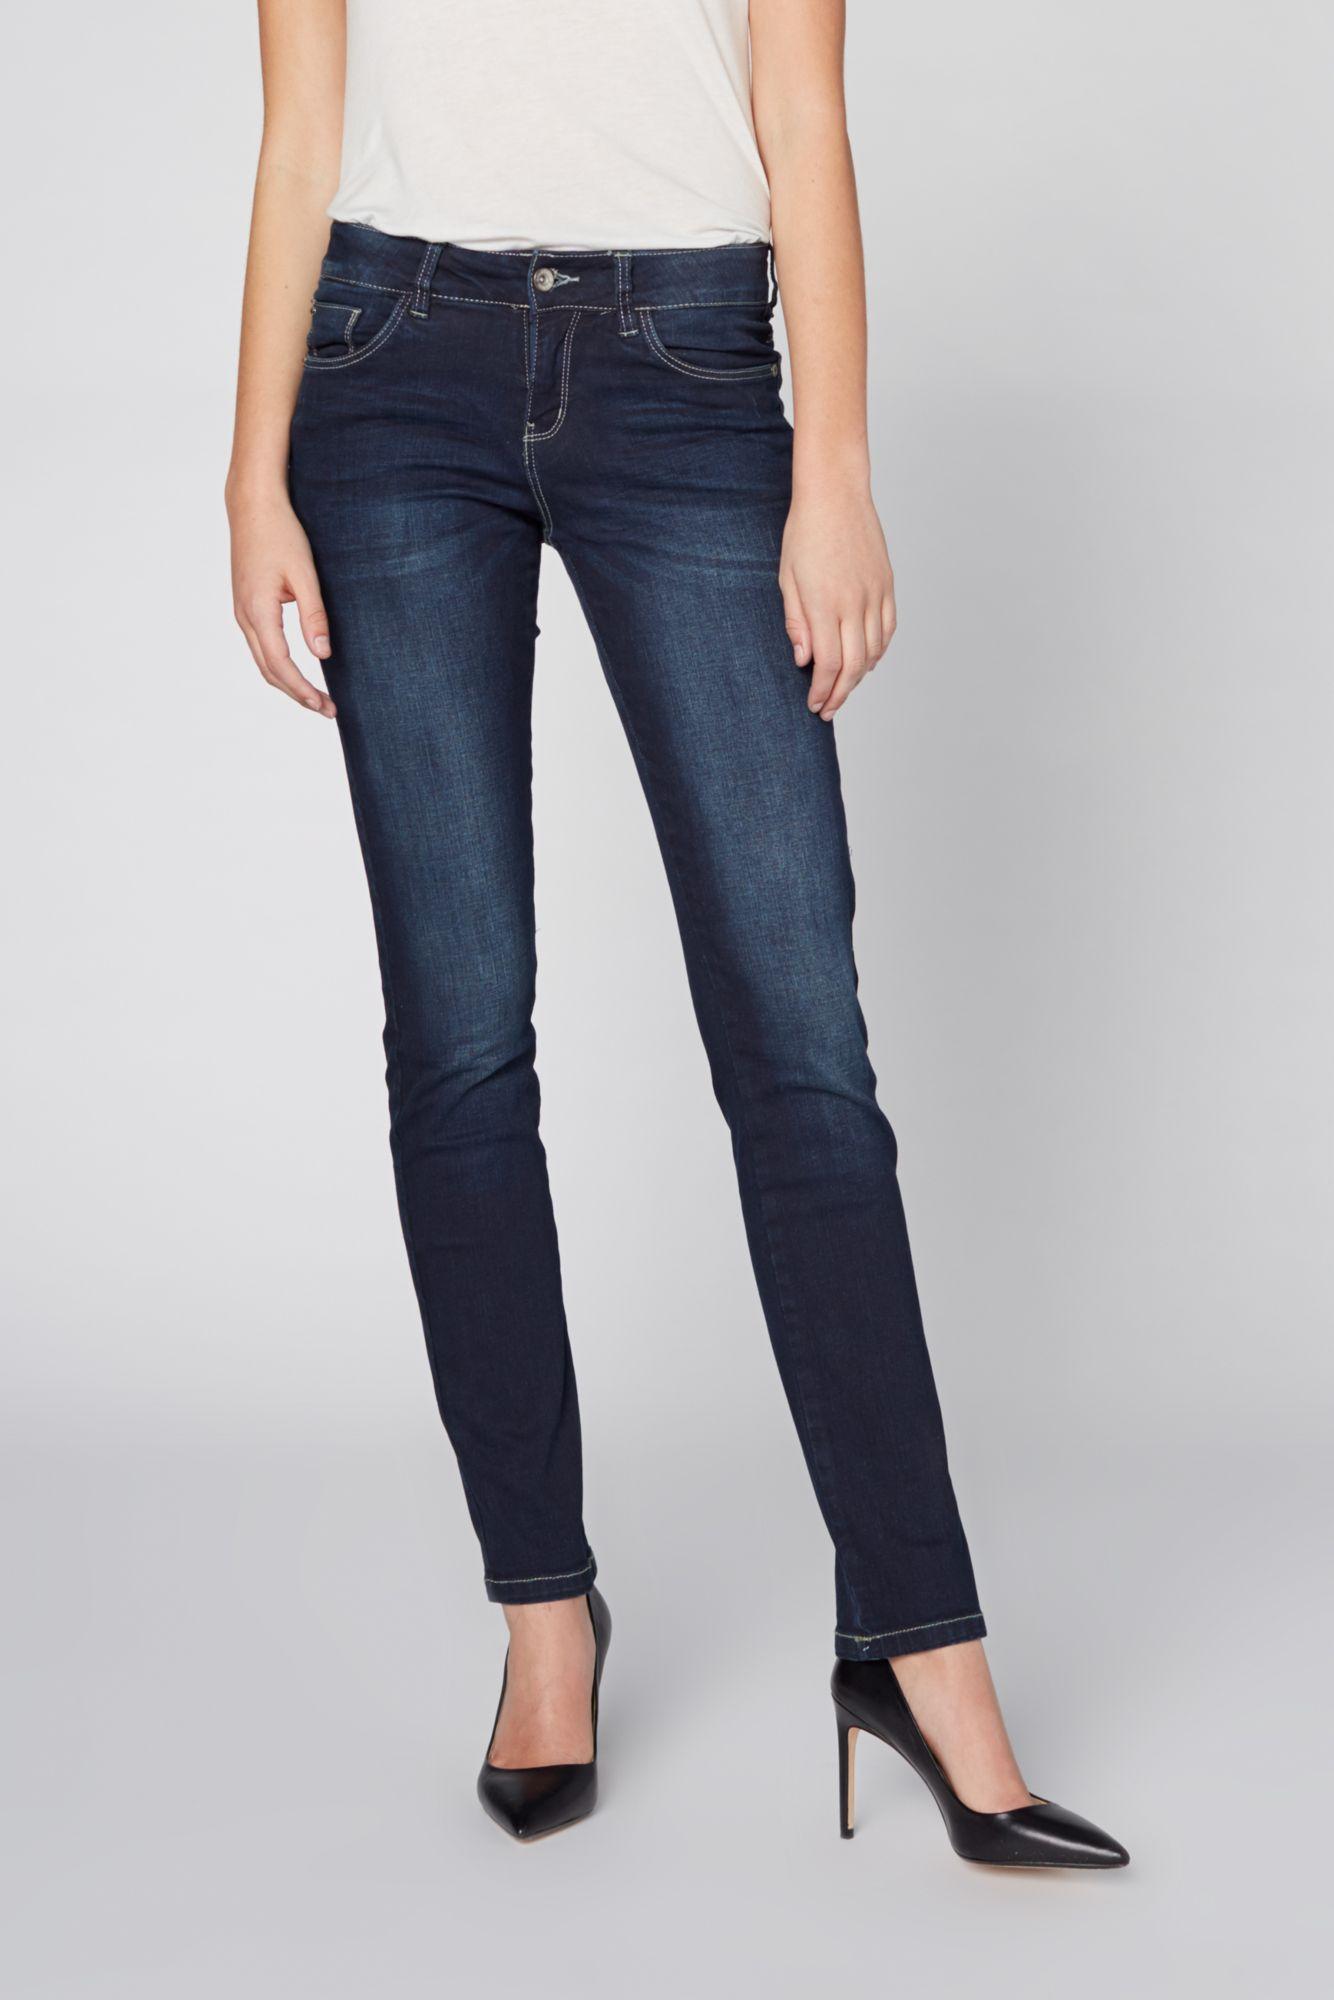 COLORADO DENIM  Jeans »C959 LAYLA Damen Jeans«